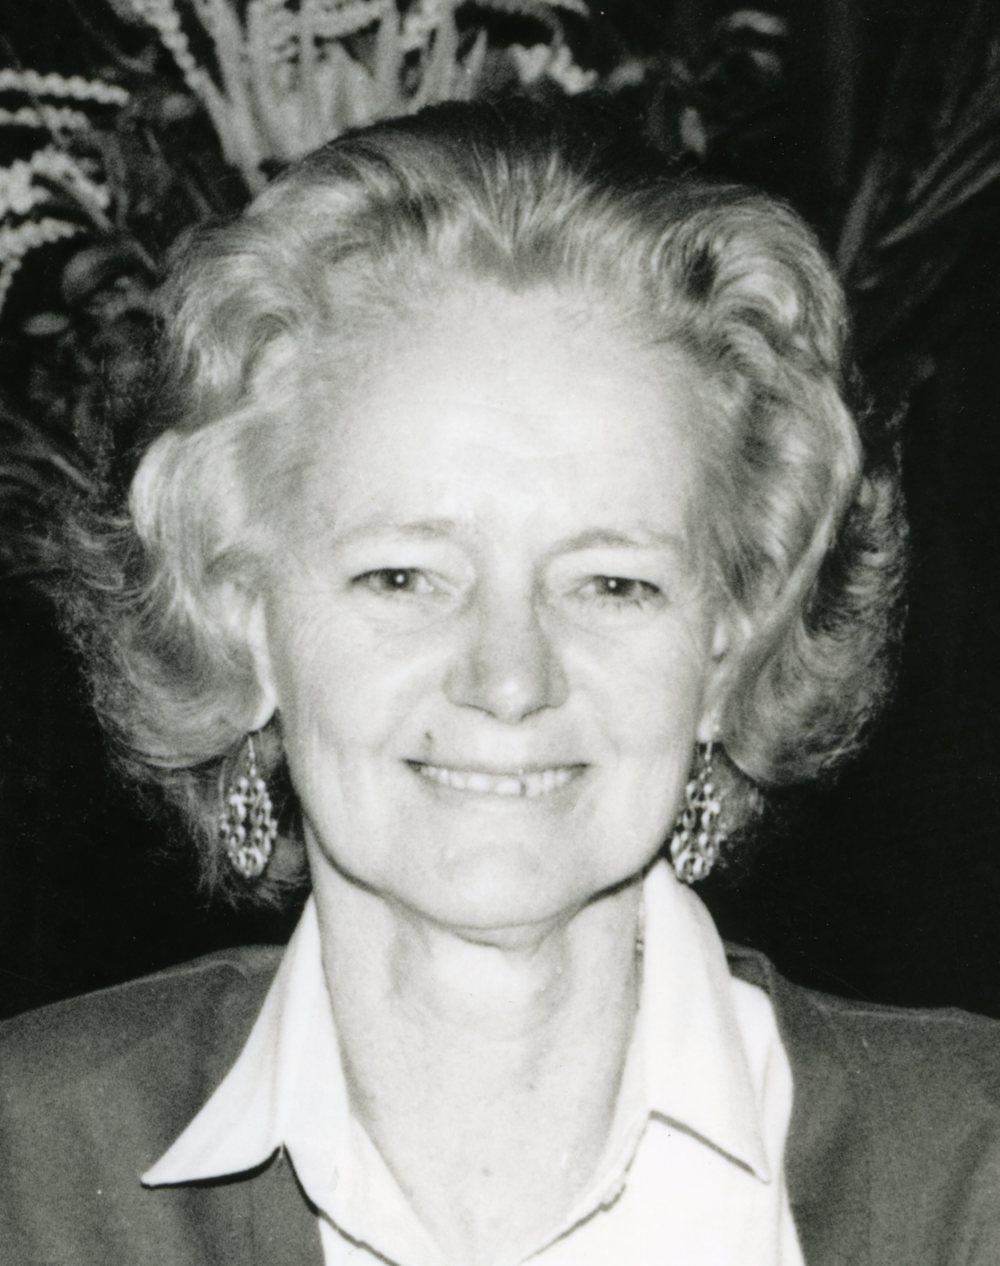 Marion Fairweather